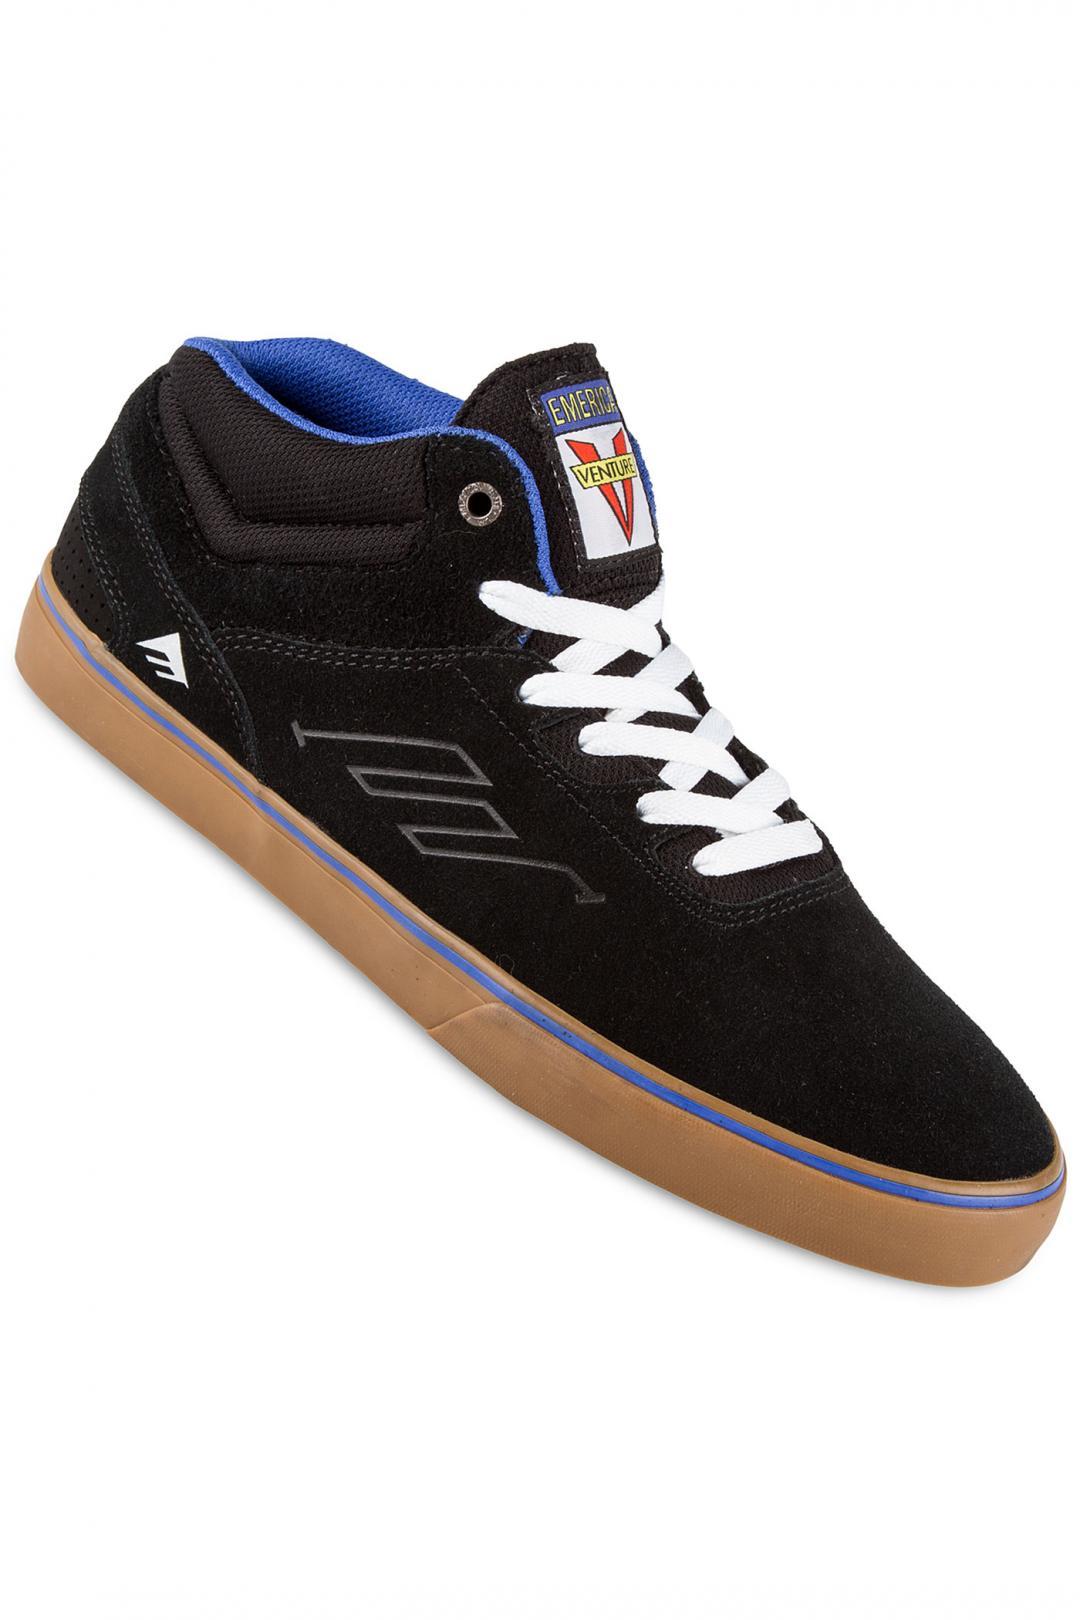 Uomo Emerica x Venture The Westgate Mid Vulc Suede black blue | Sneakers mid top